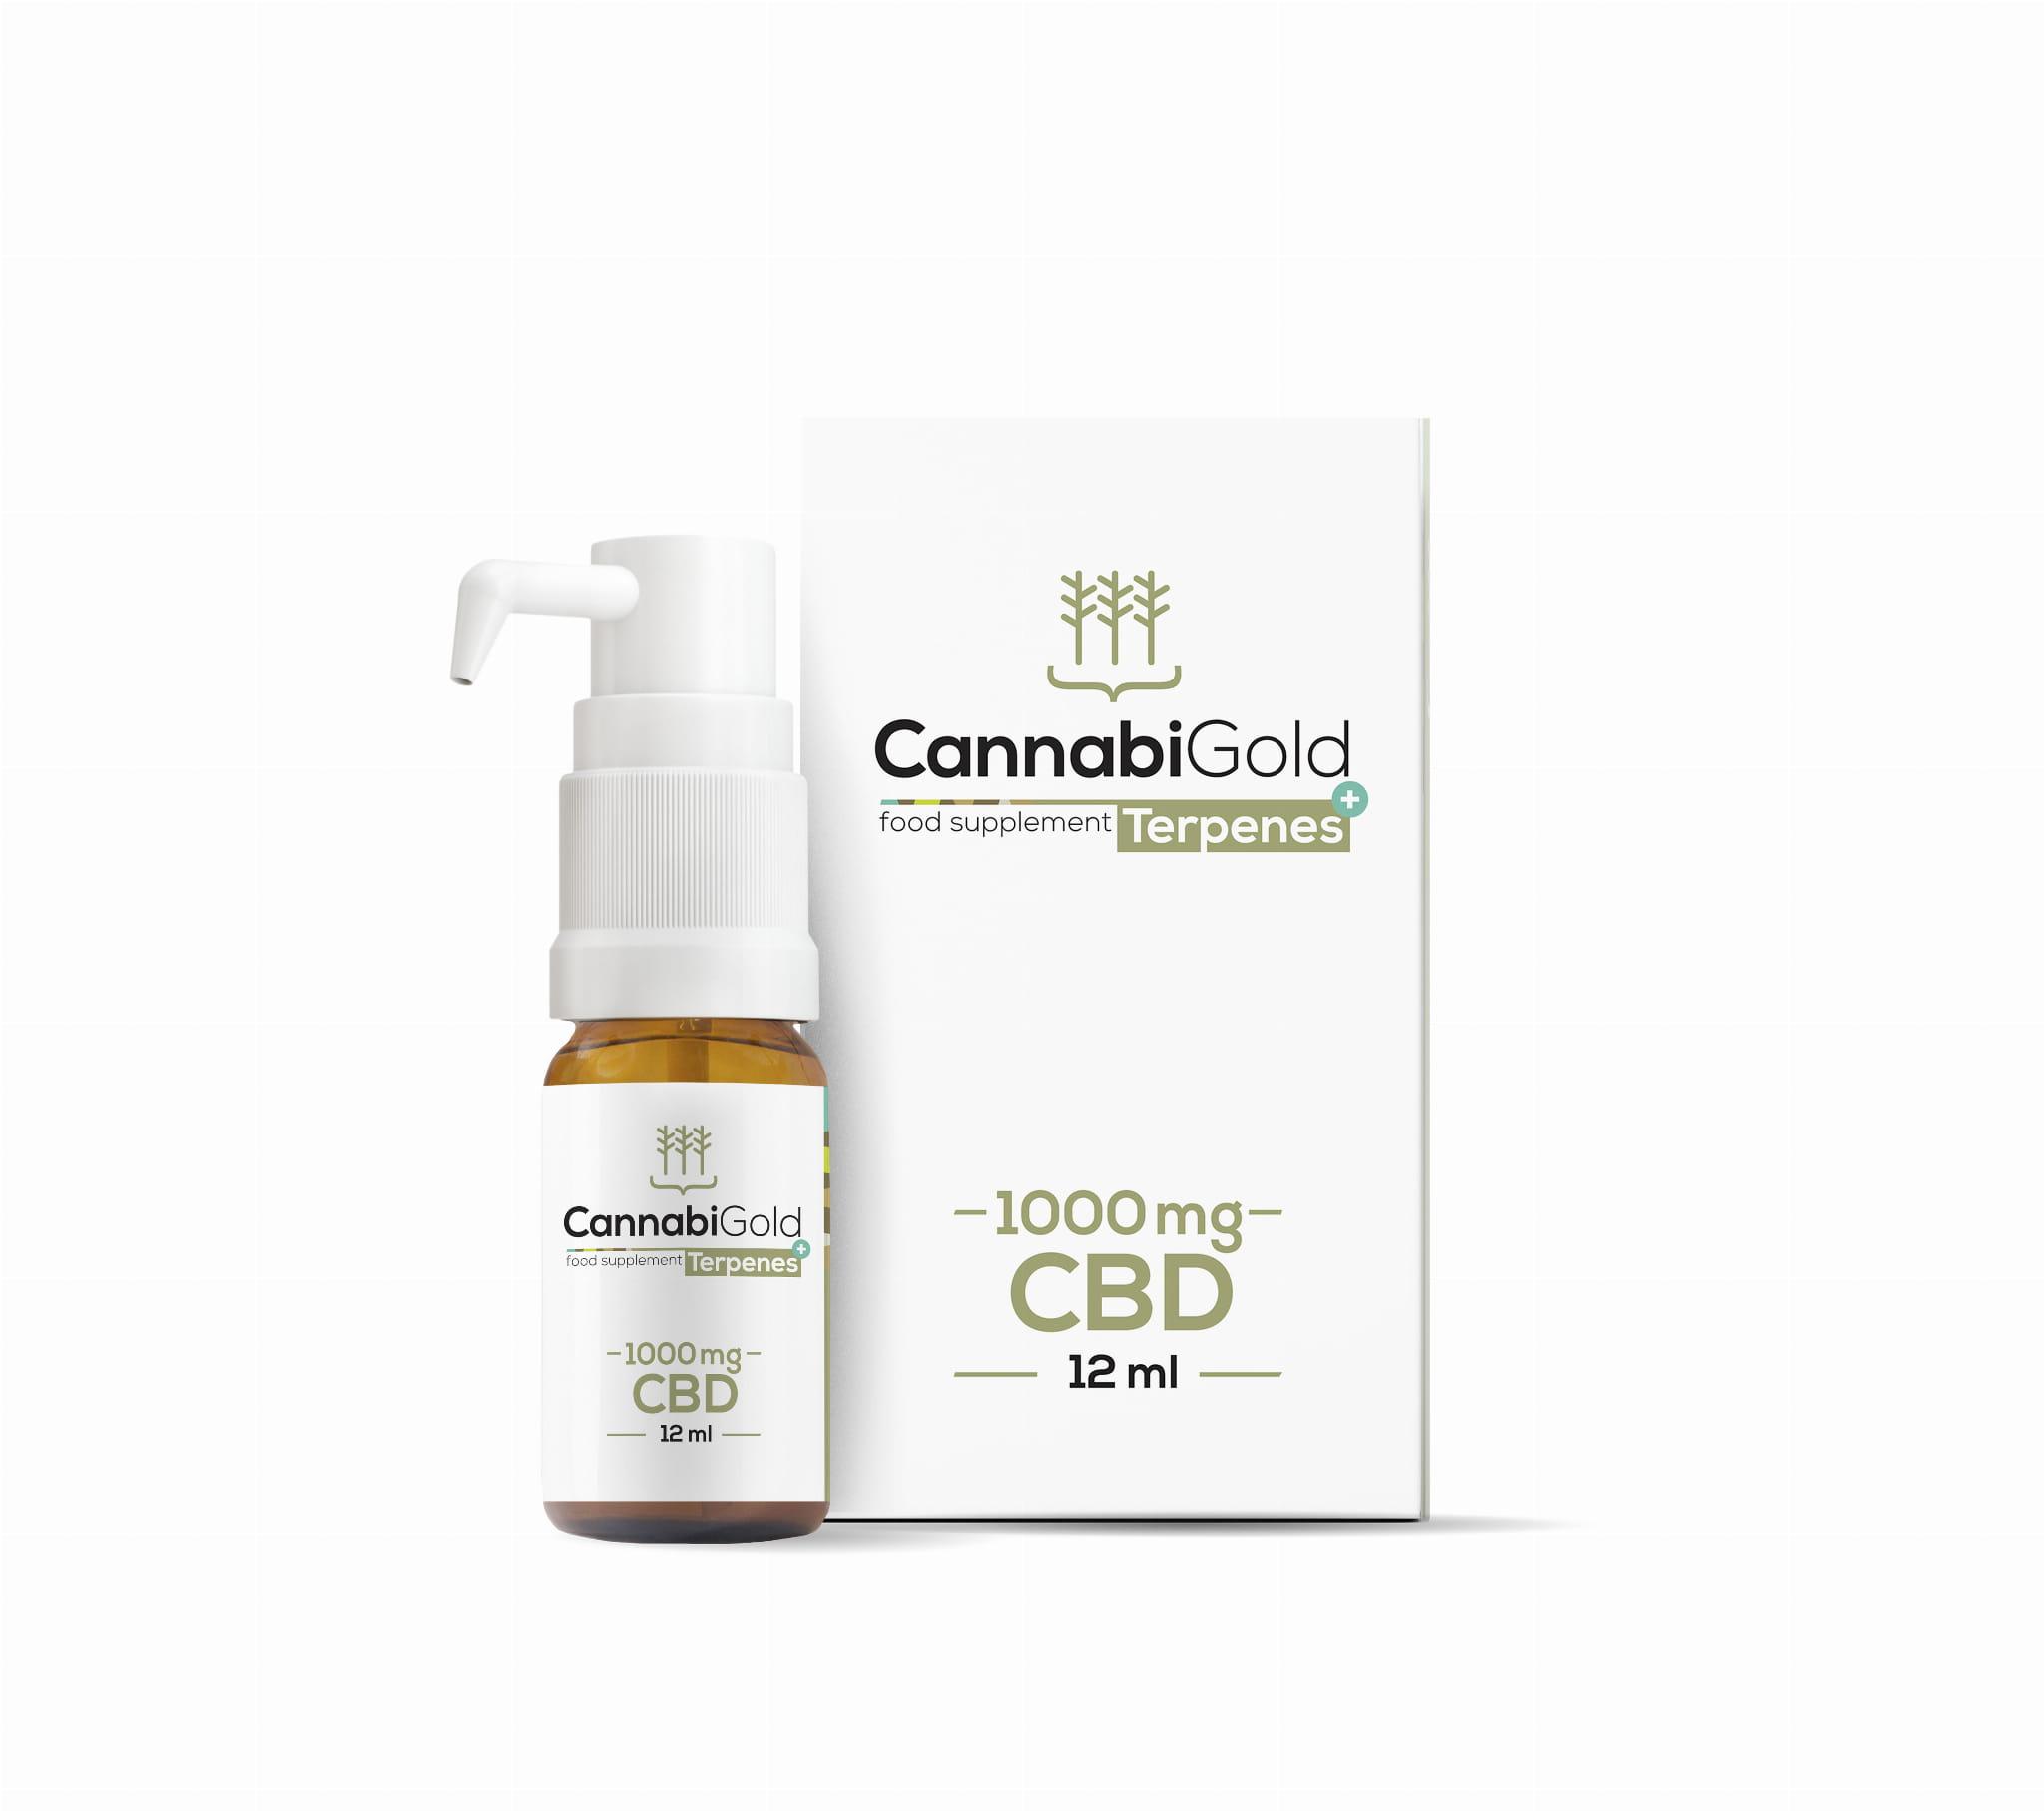 Olejek CBD CannabiGold Terpenes+ Kannabidiol i terpeny w oleju 1000mg